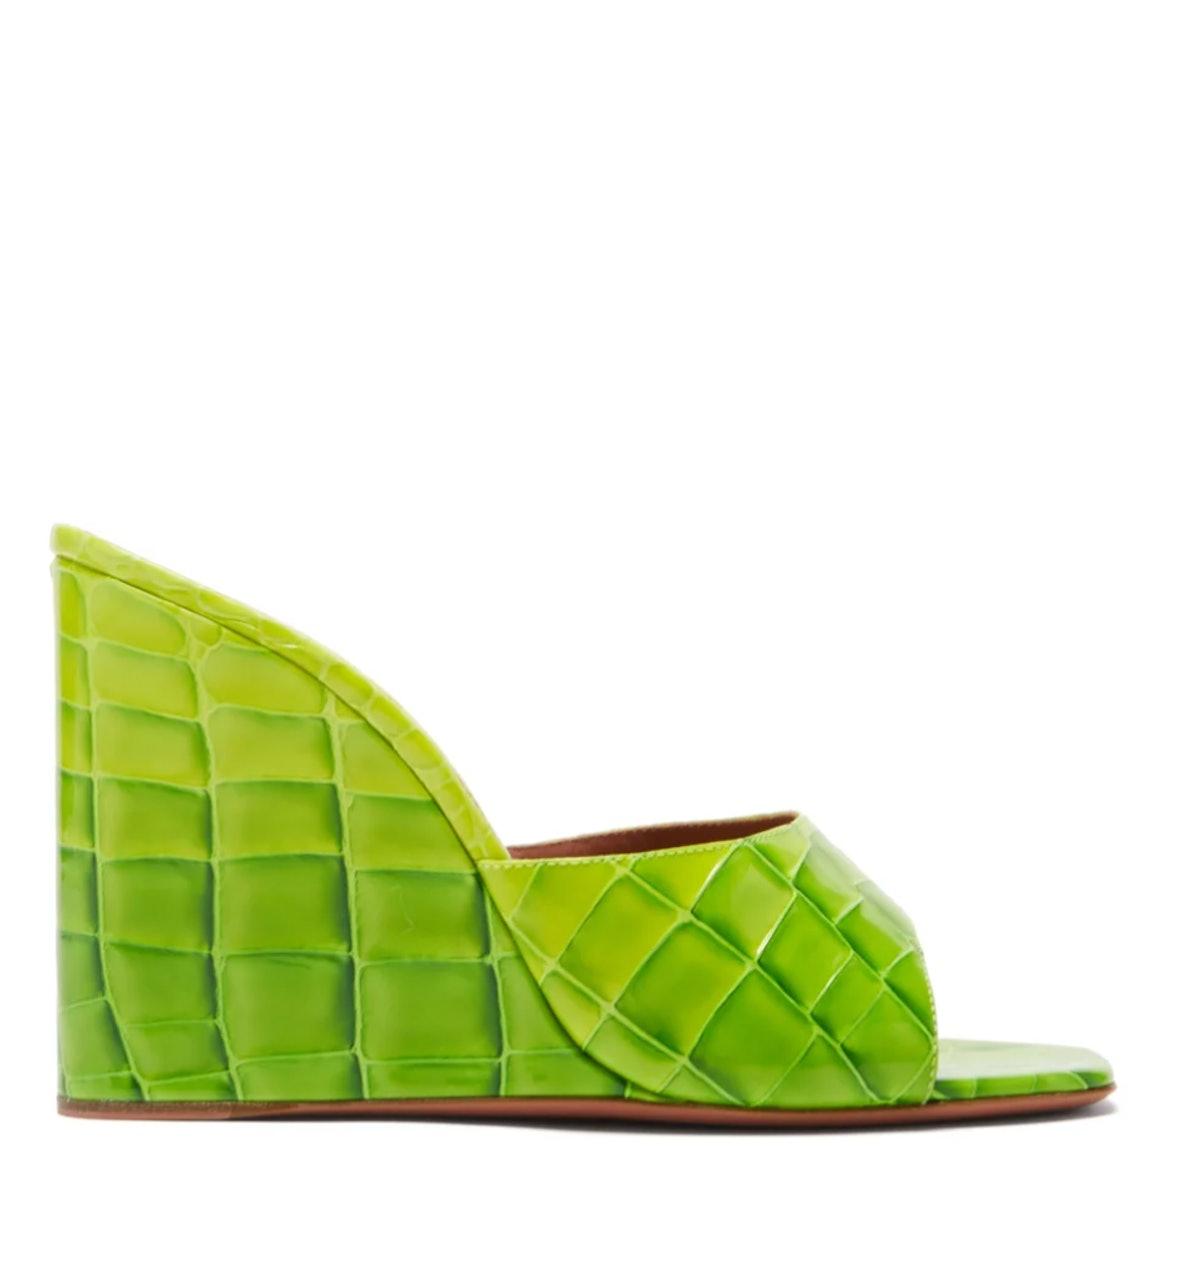 Lupita Croc-Embossed Wedges